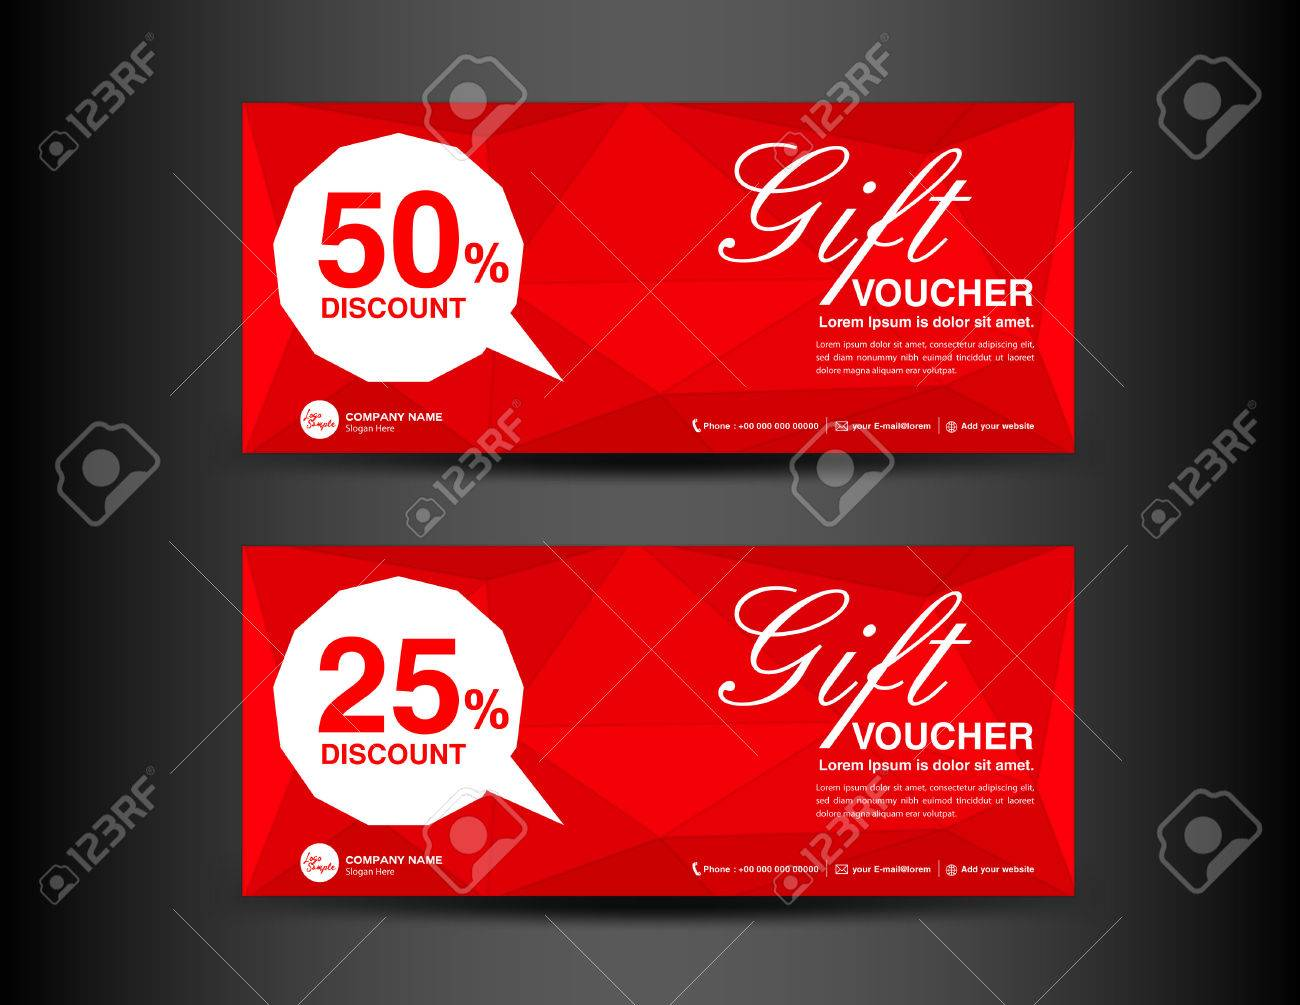 Red Discount Voucher Template, Coupon Design,ticket, Banner,cards,polygon  Background  Discount Voucher Design